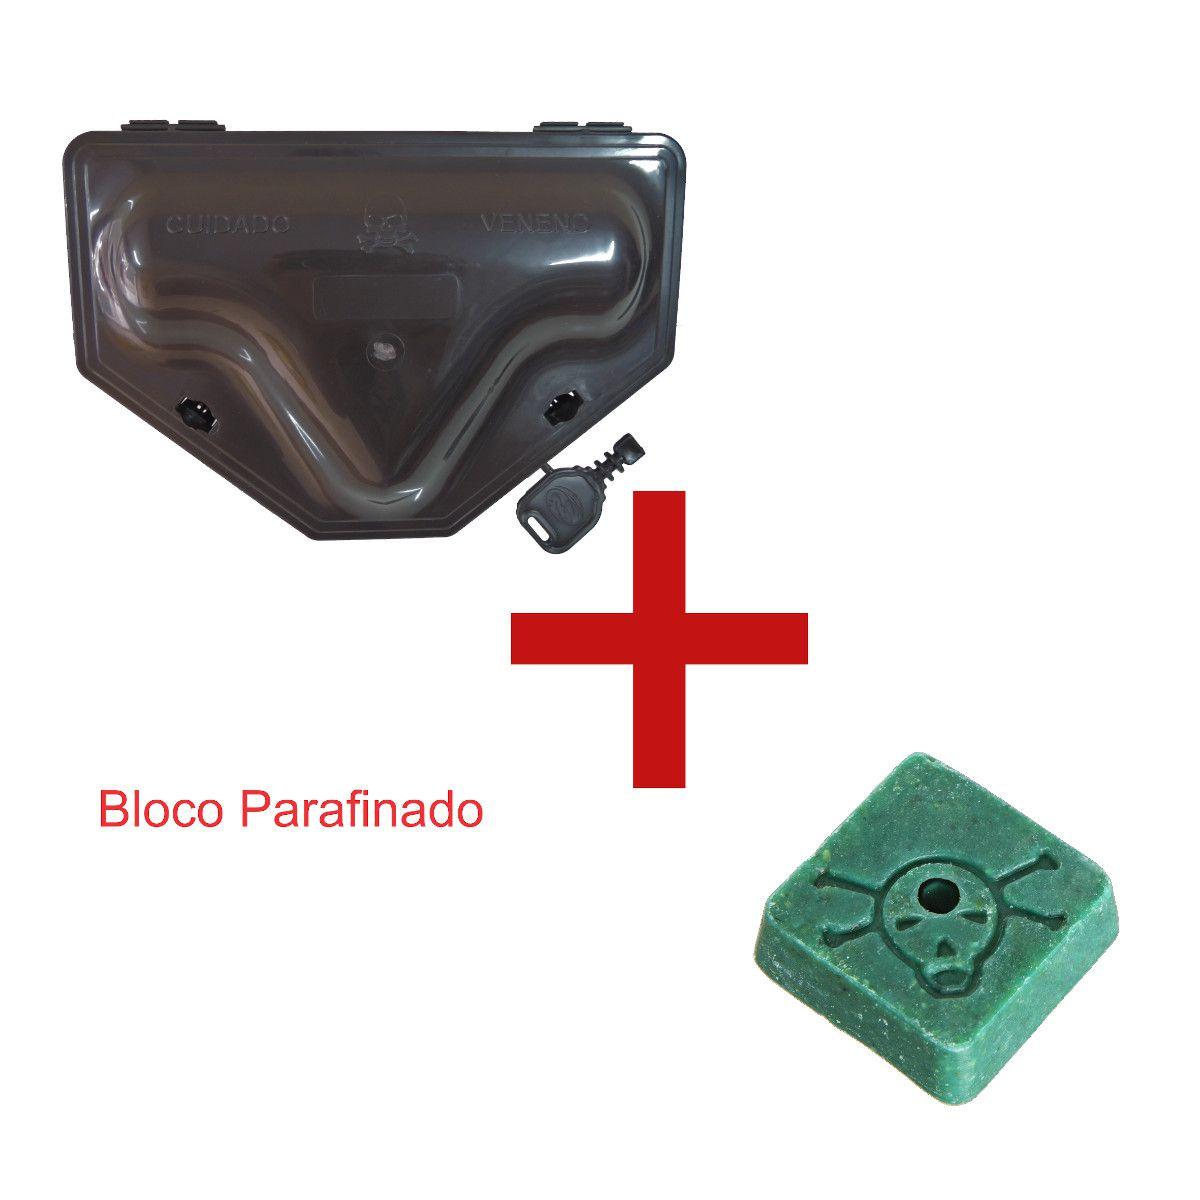 KIT 70 Porta Iscas Reforçado 2 TRAVAS Chave Ratoeira p/Ratos